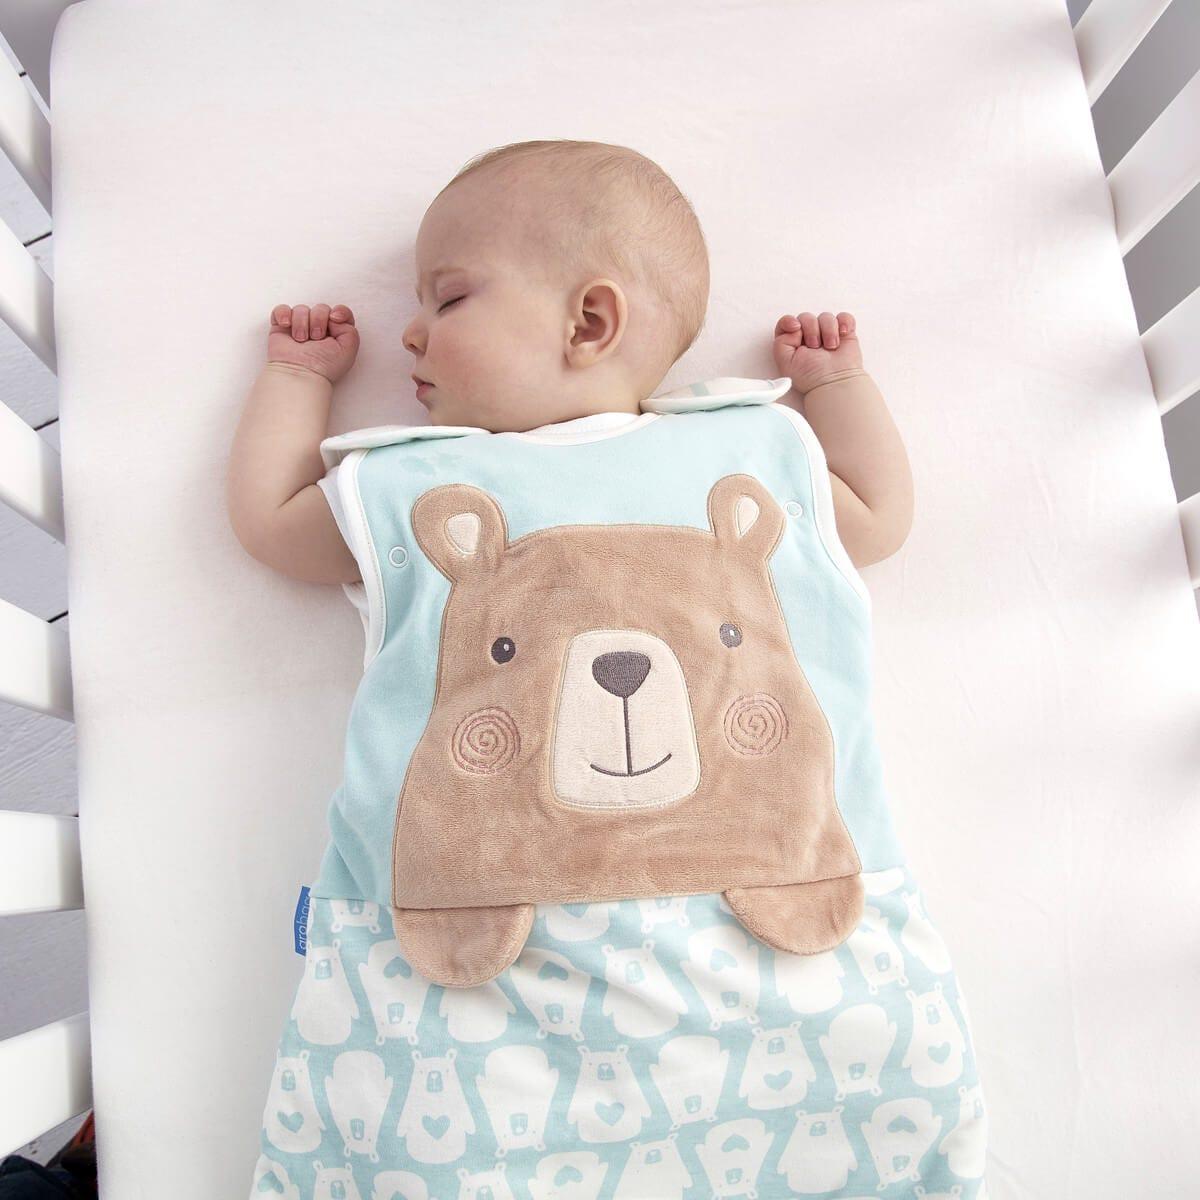 baby-in-cot-sleep-wearing-0-6-month-bennie-bear-grobag